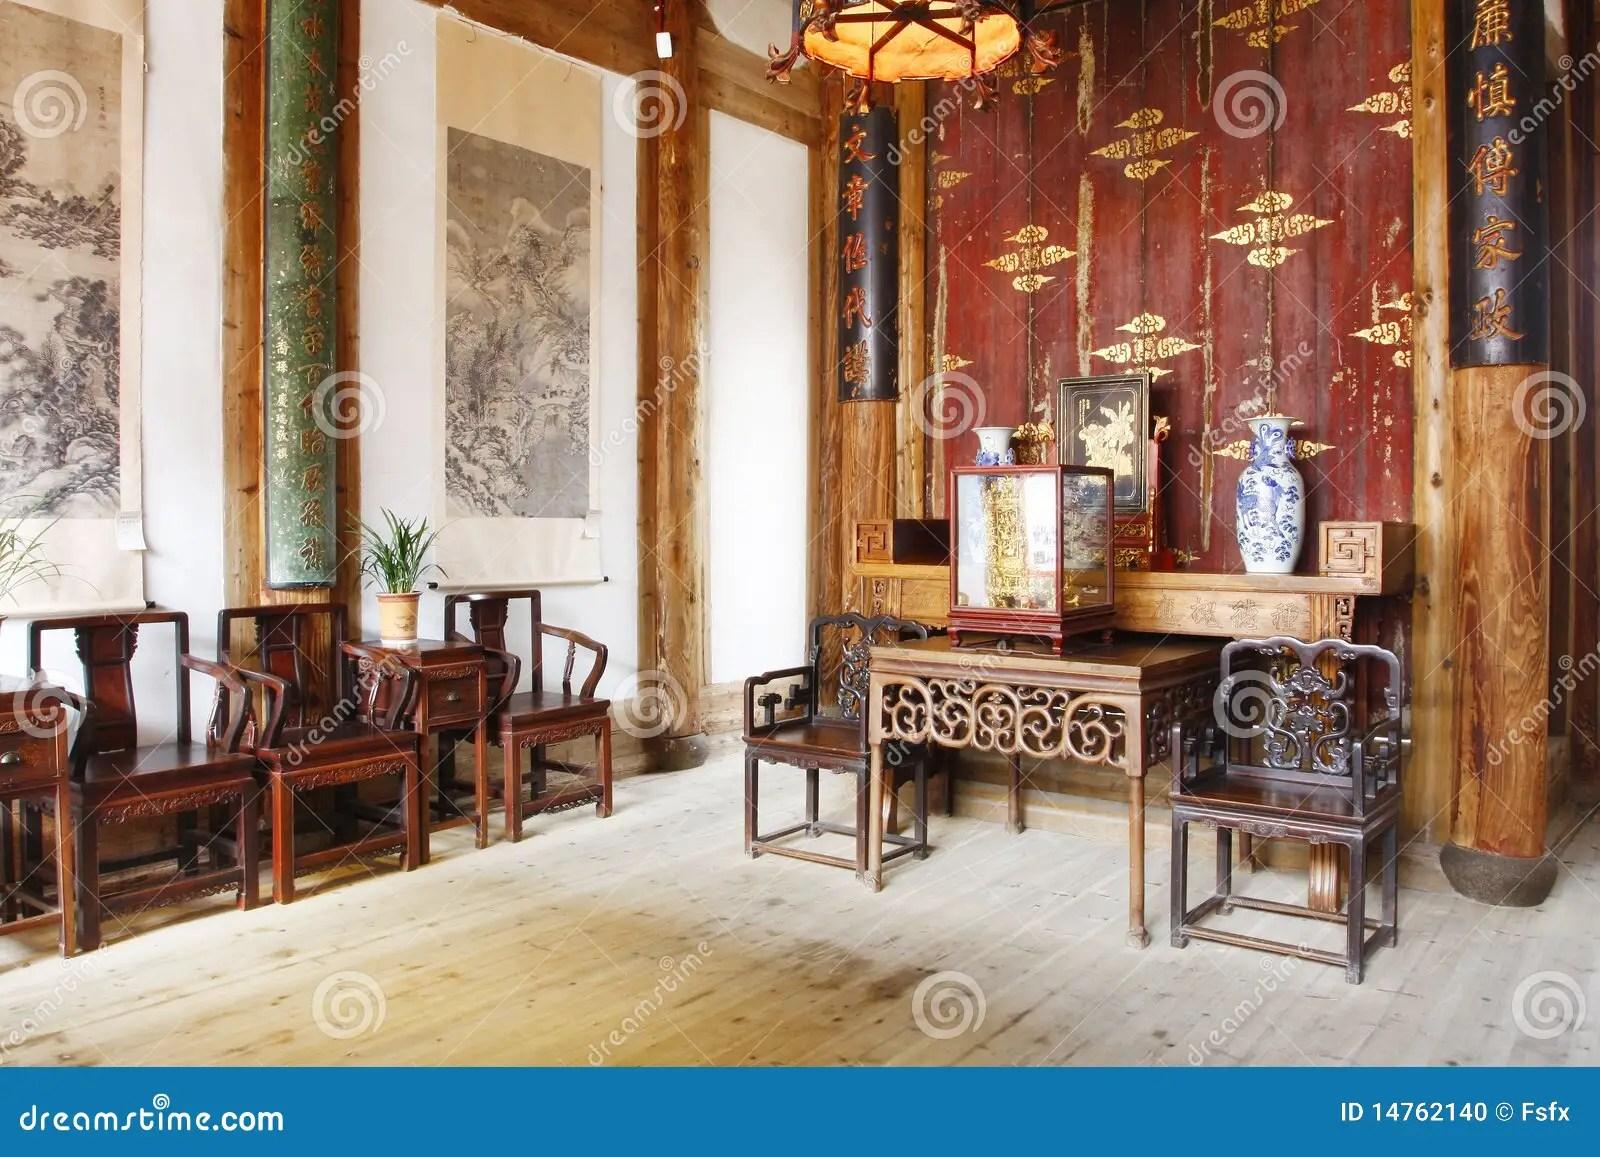 Chinese Old House Stock Photo Image 14762140